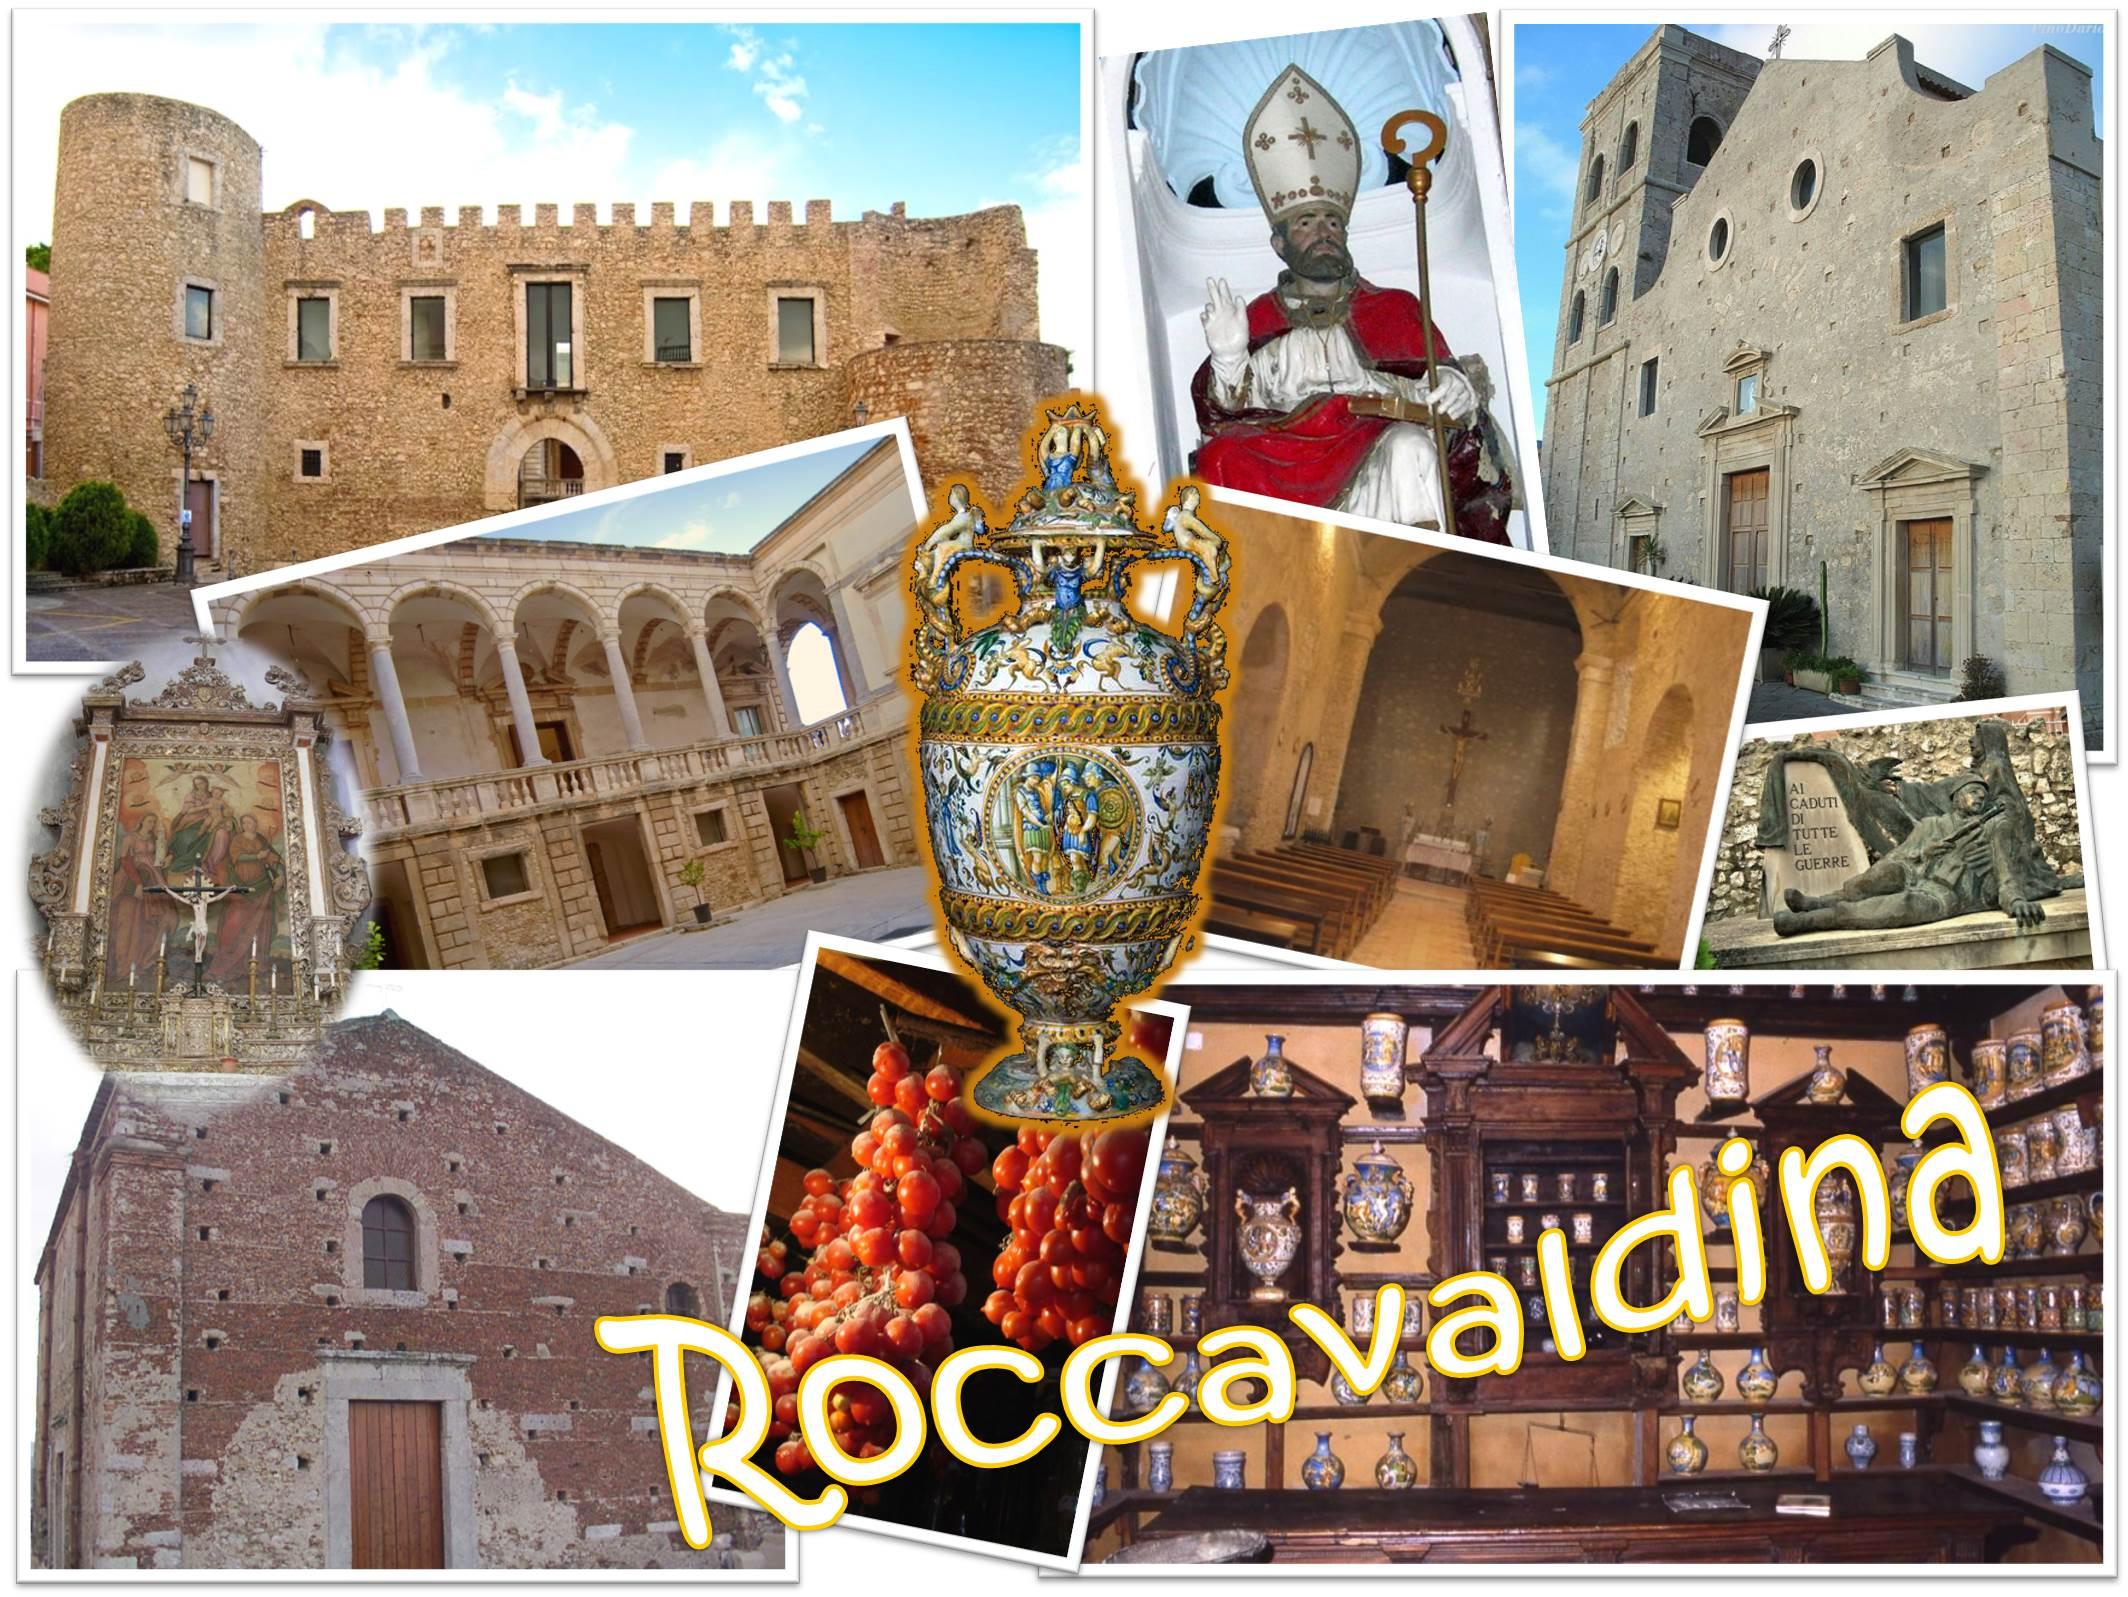 roccavaldina1